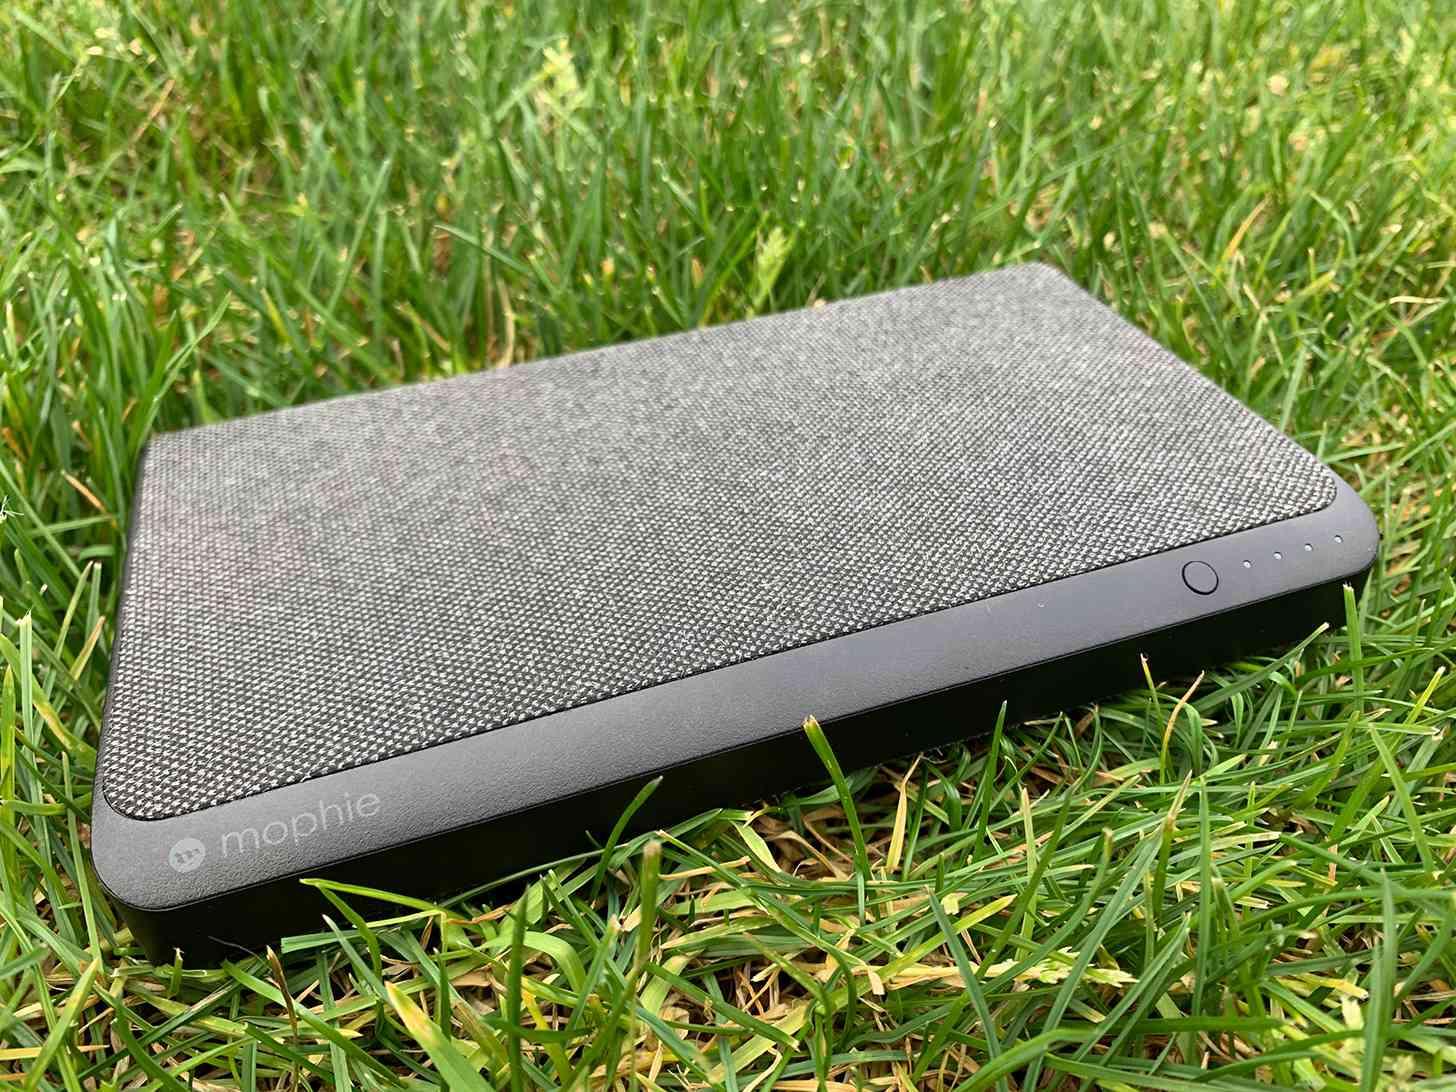 Mophie Powerstation Usb C 3xl Review Phonedog Creators of the original juice pack battery. mophie powerstation usb c 3xl review